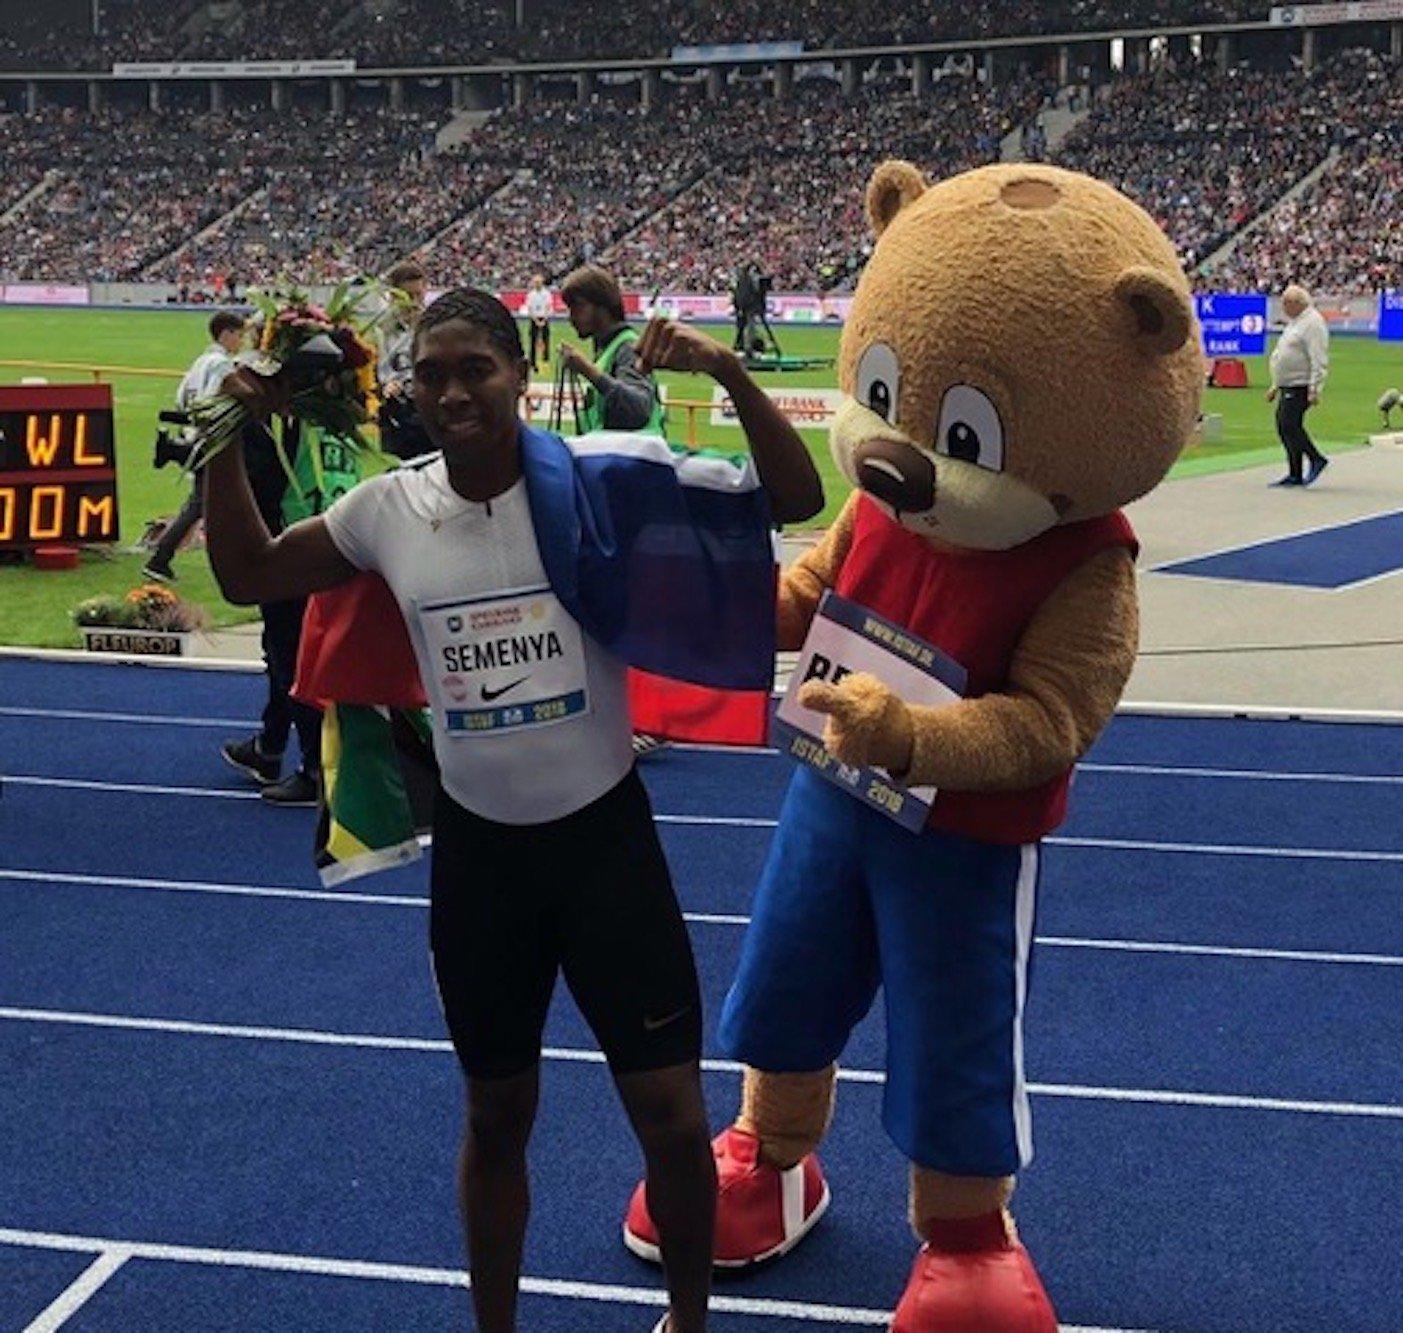 2018 ISTAF Berlin  Caster Semenya clocks fifth fastest 1 6e8c73ef09